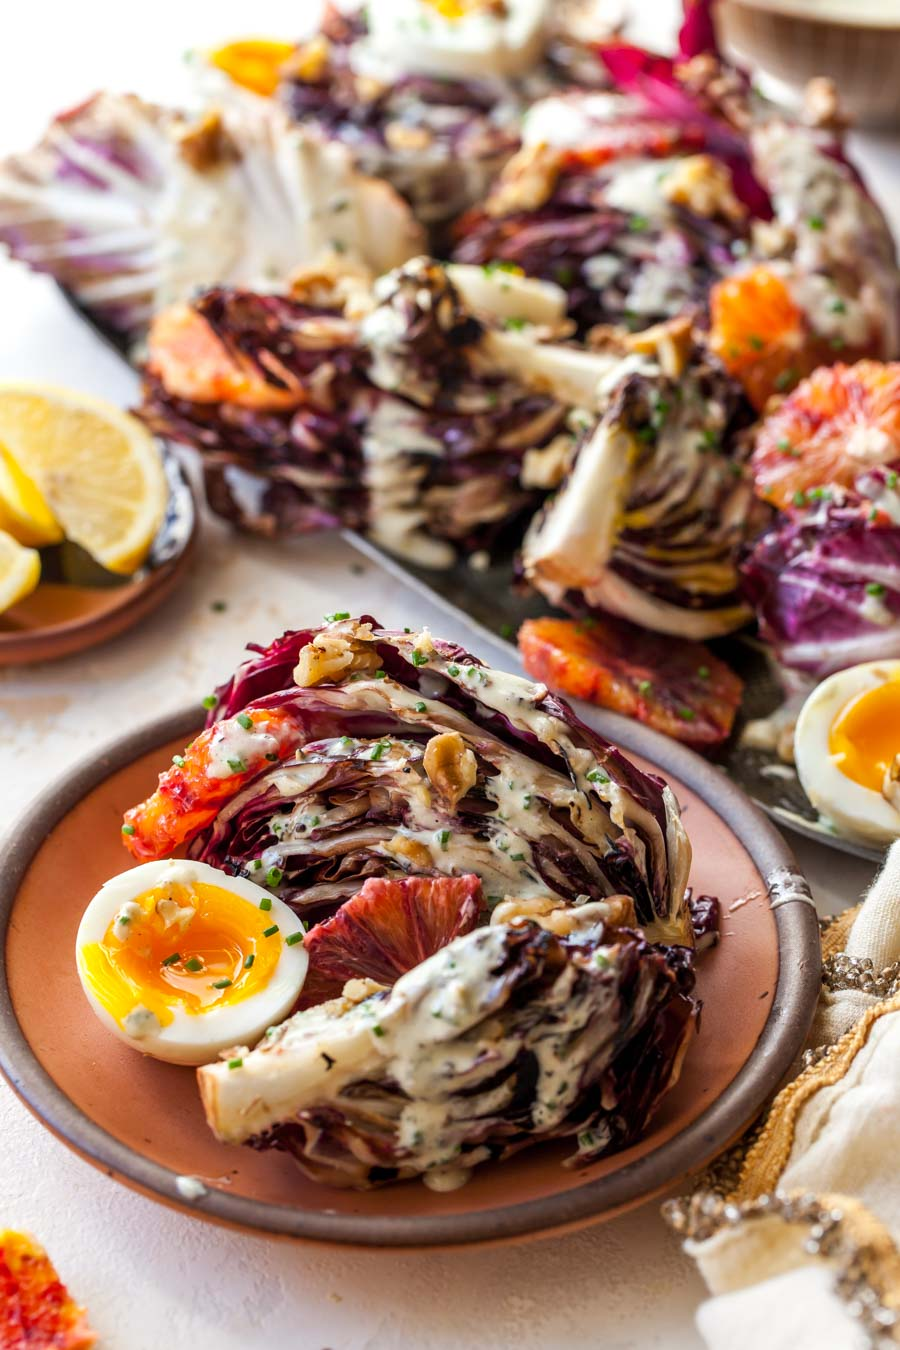 Radicchio Salad with Miso Dressing, Eggs, Citrus, and Walnuts